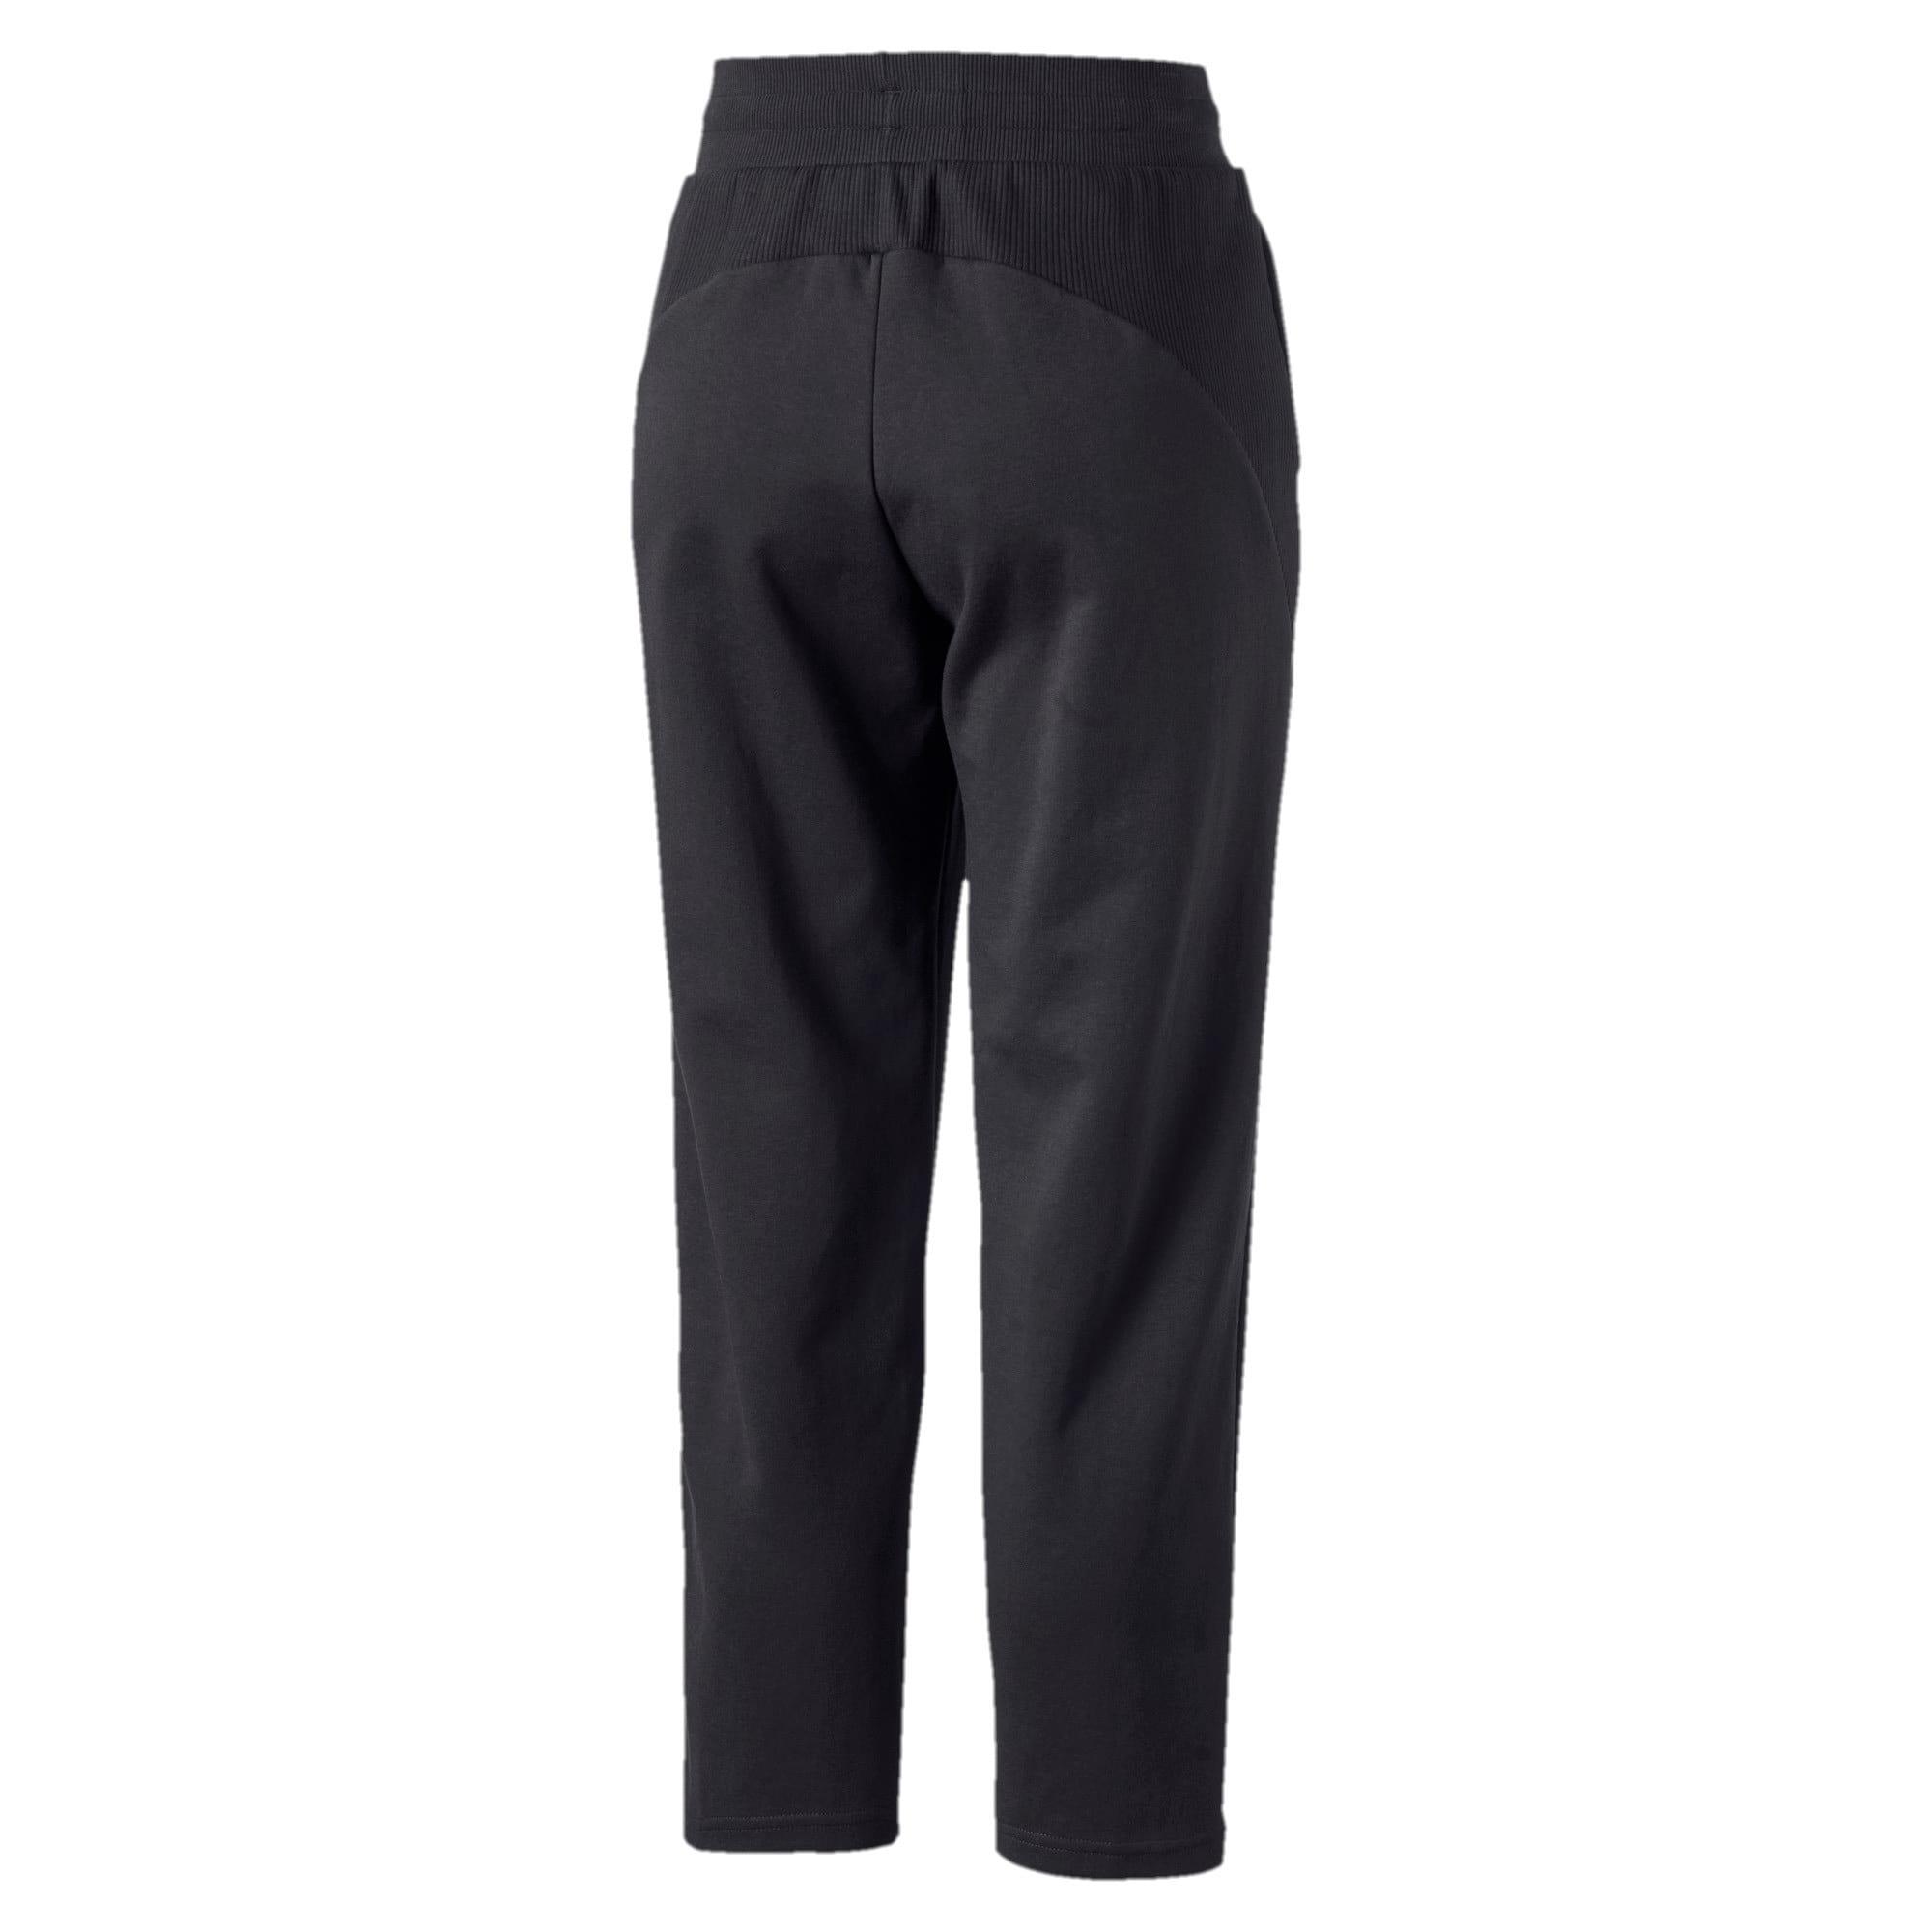 Thumbnail 5 of Fusion Women's Sweatpants, Cotton Black, medium